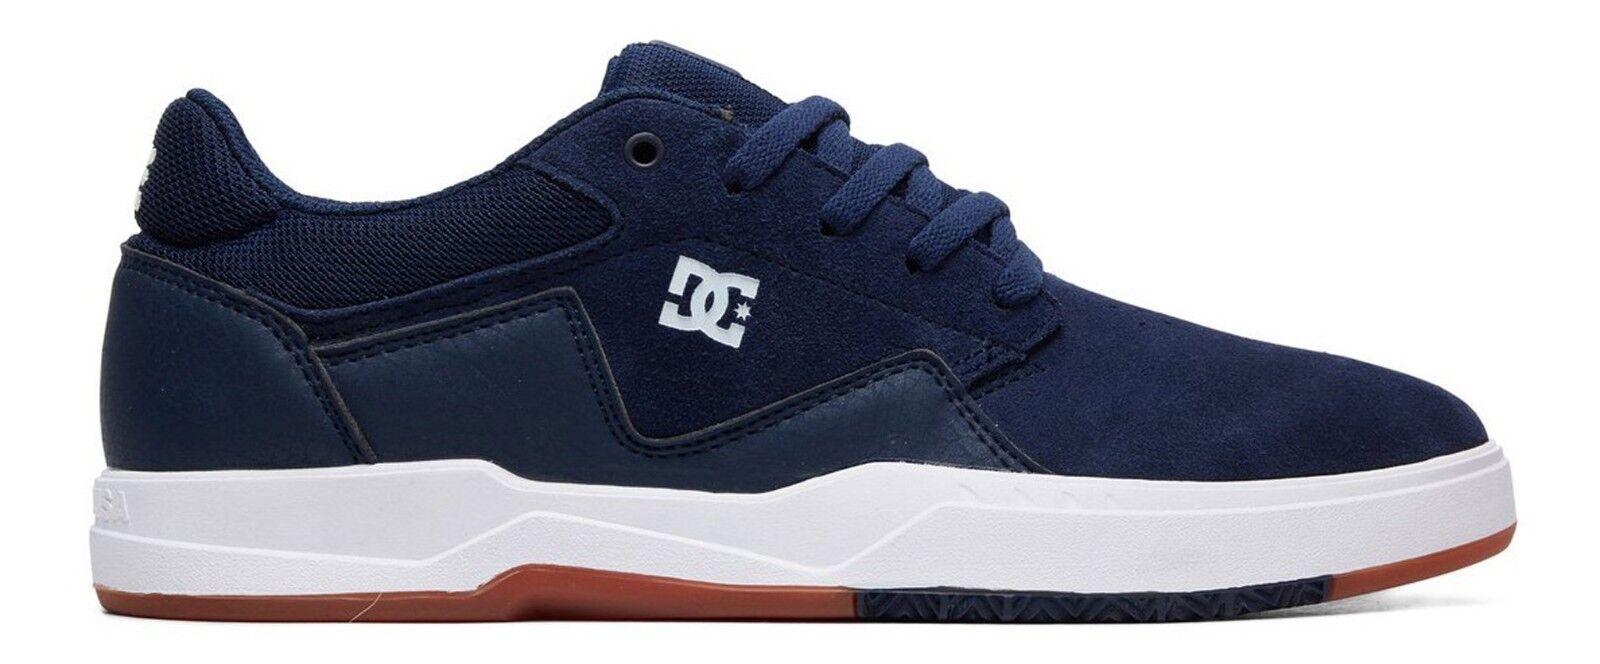 DC zapatos Men Barksdale-Navy blanco